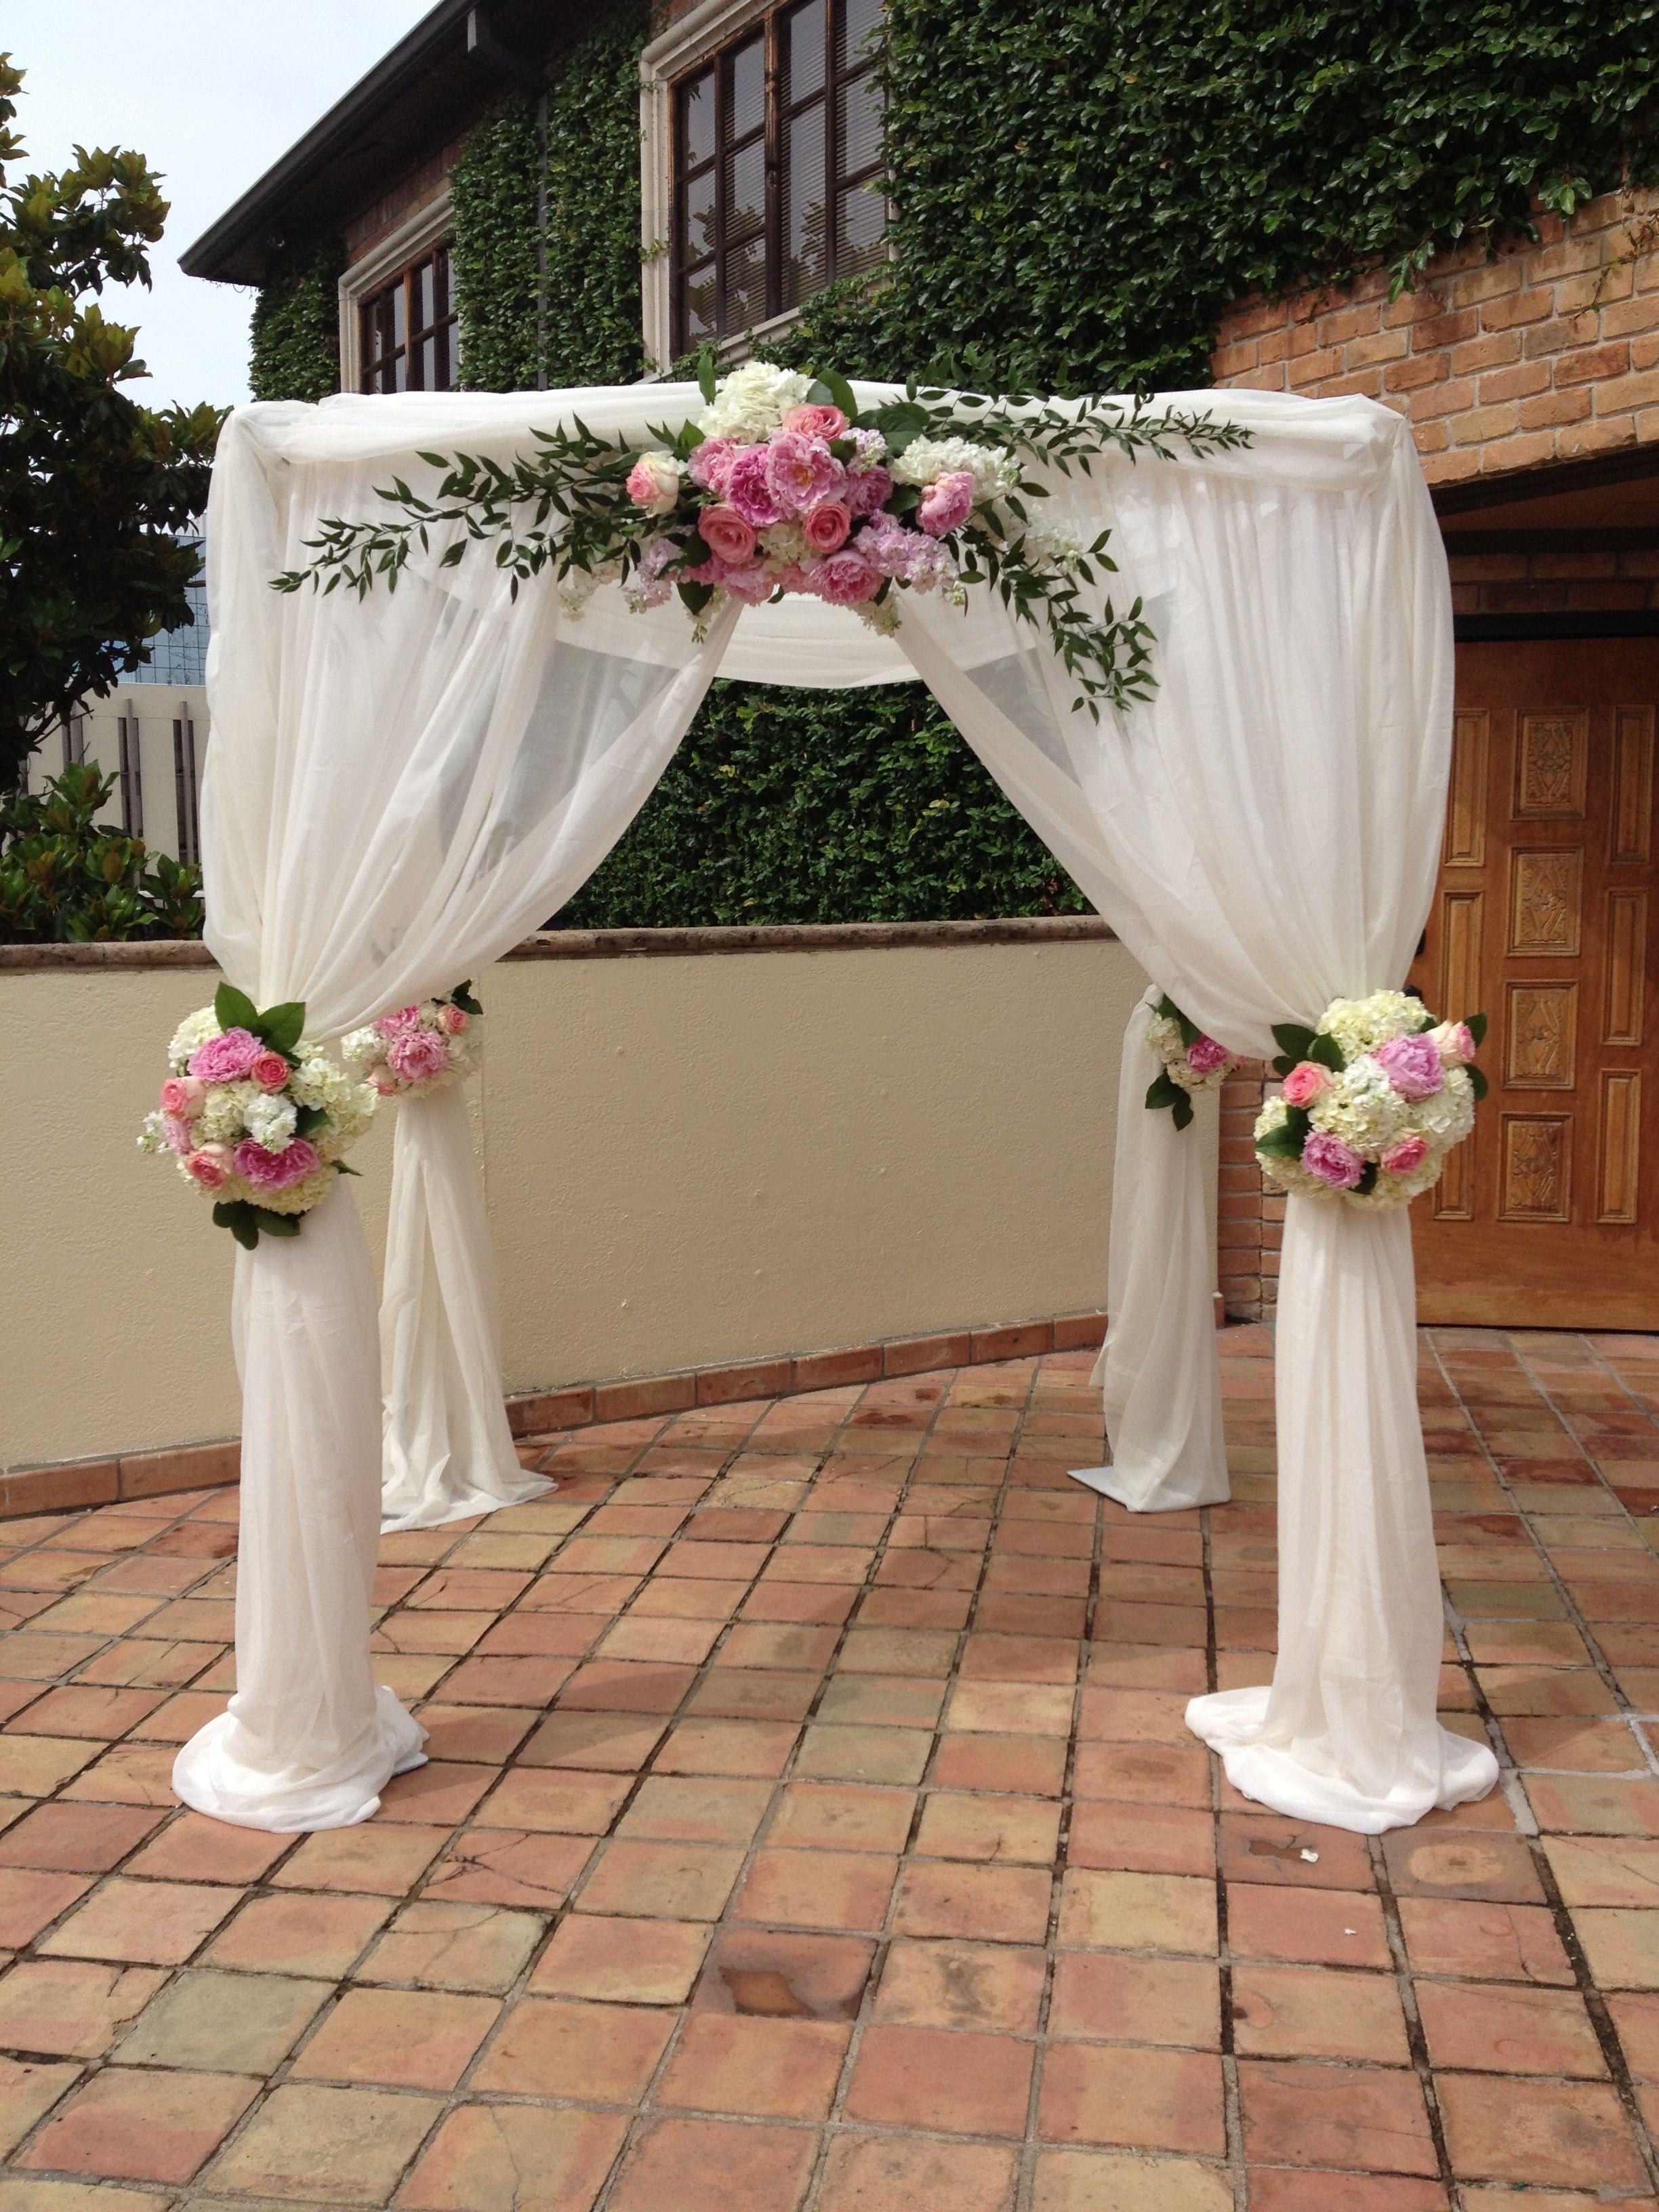 Wedding Gazebo - over sweetheart table at reception ...